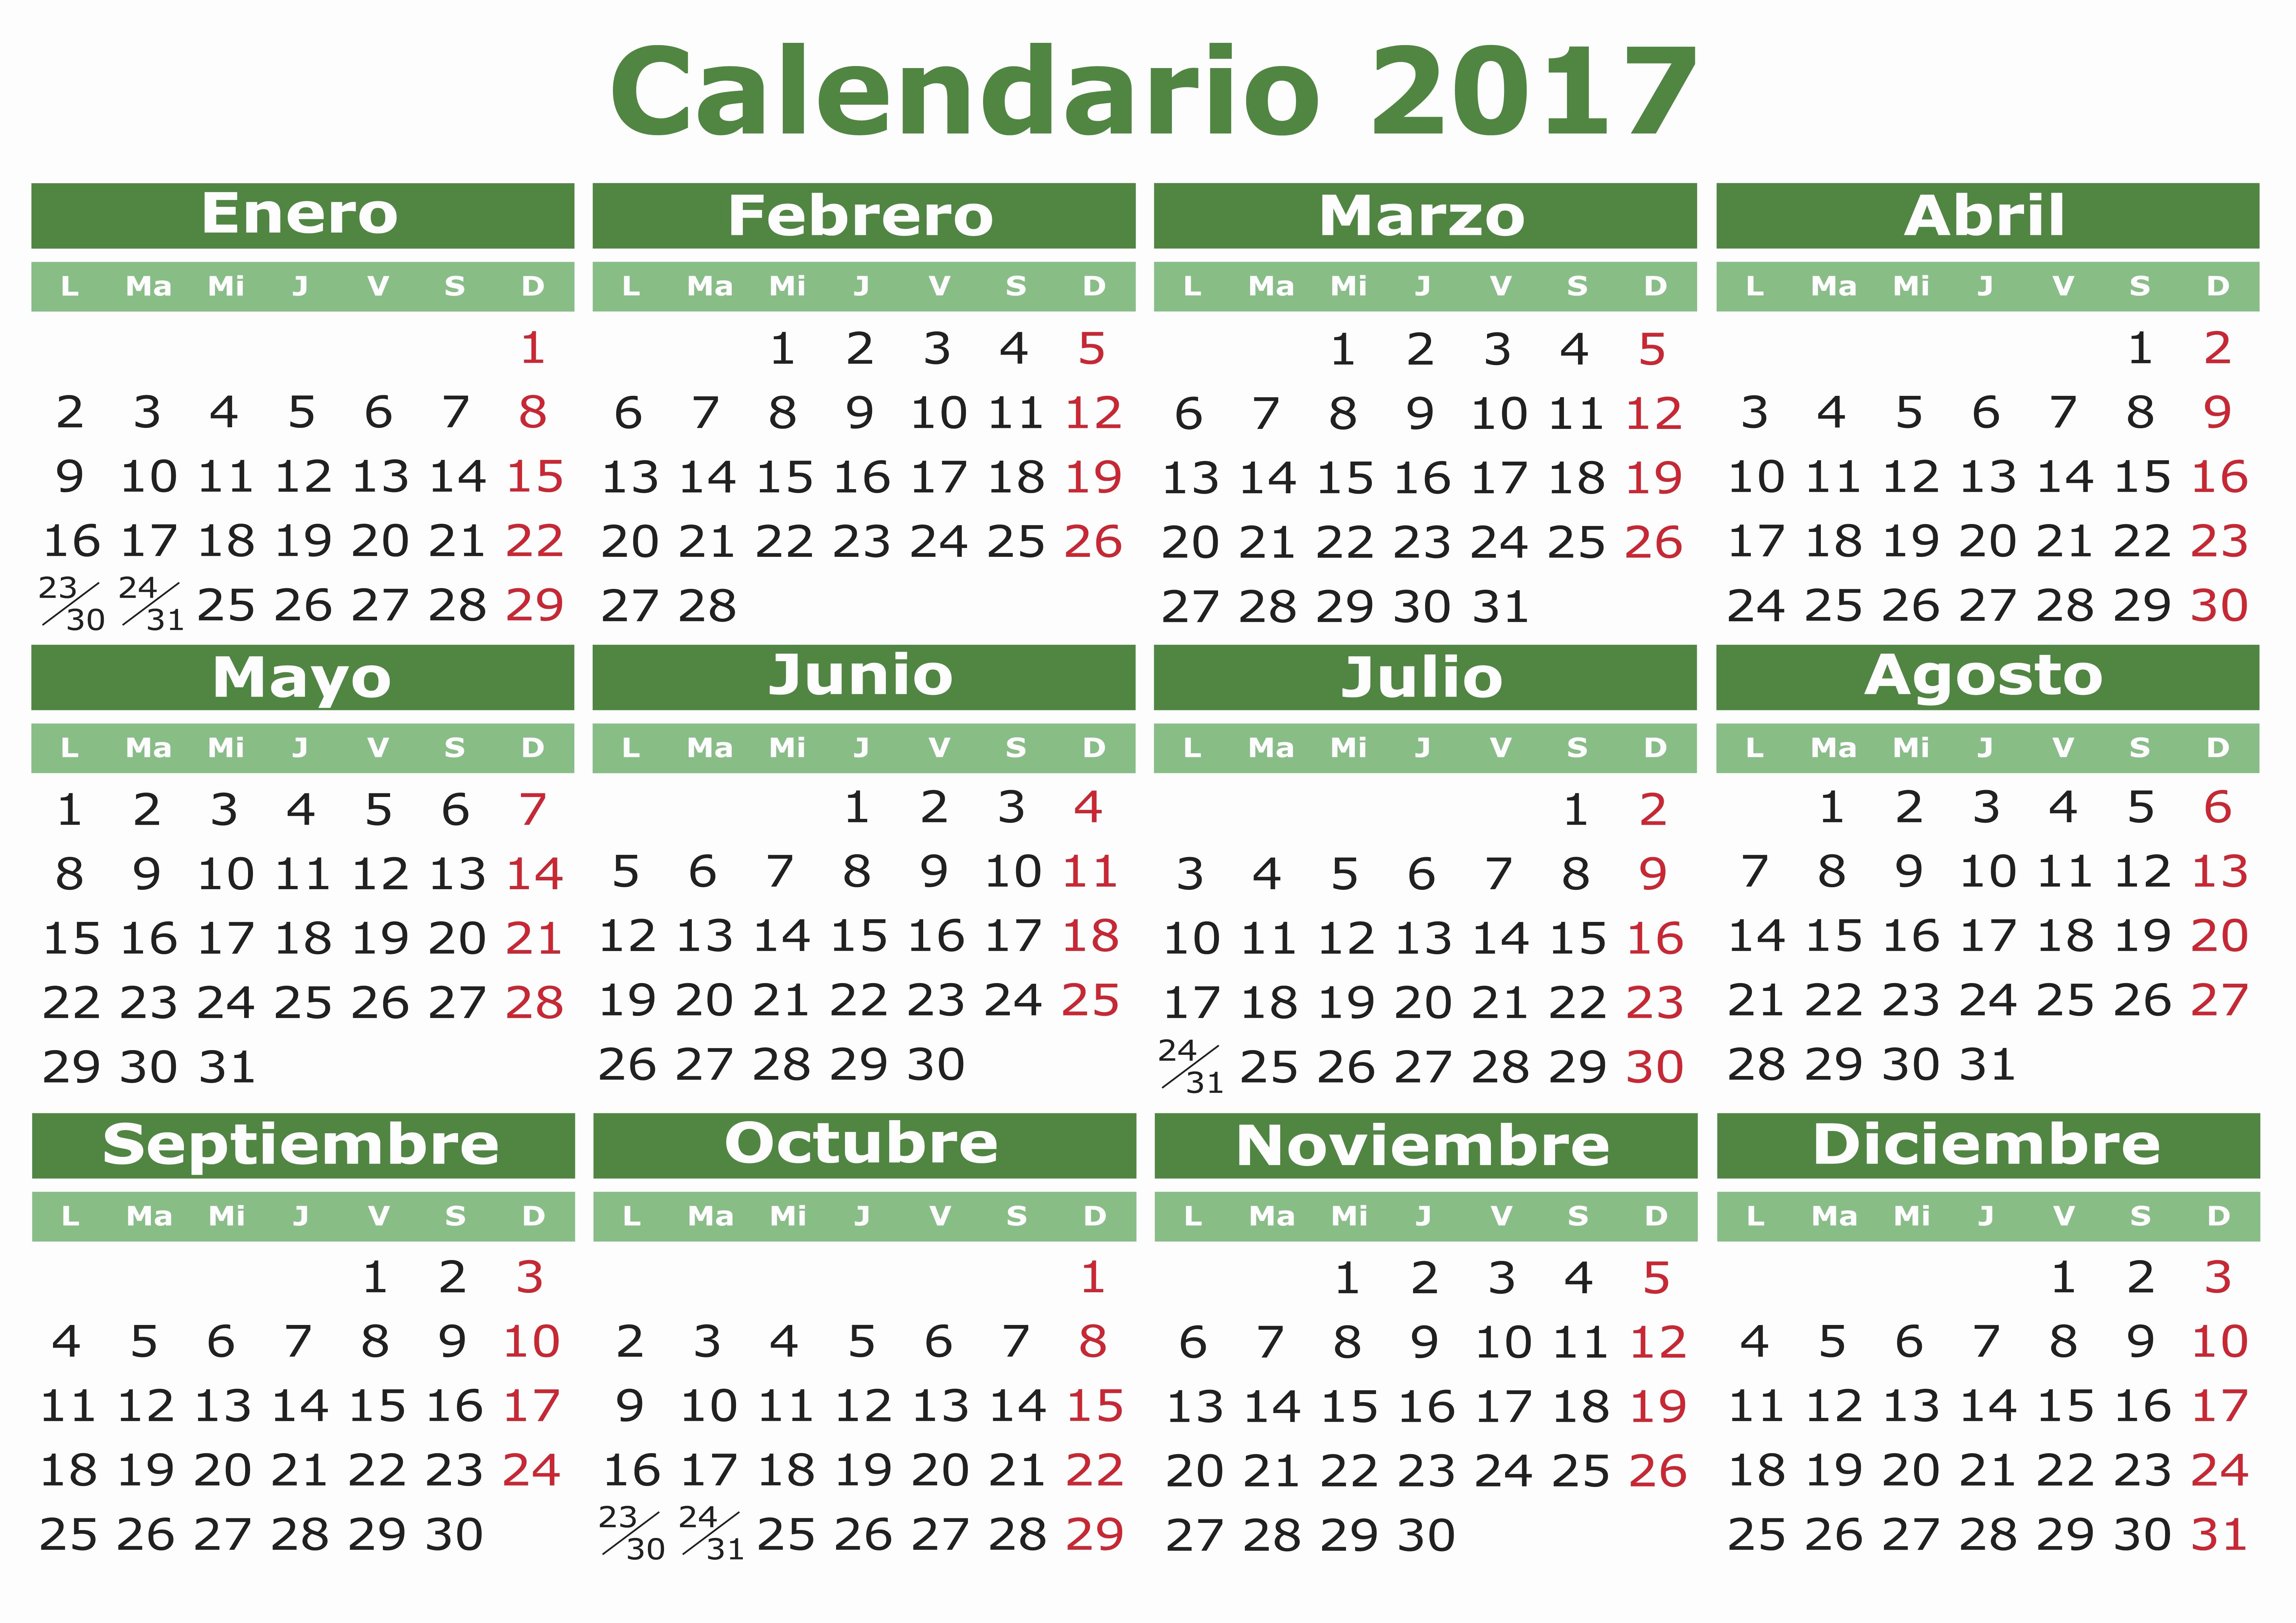 Calendario Diciembre 2017 Para Imprimir Elegant Spanish Calendar 2017 orientación andújar Recursos